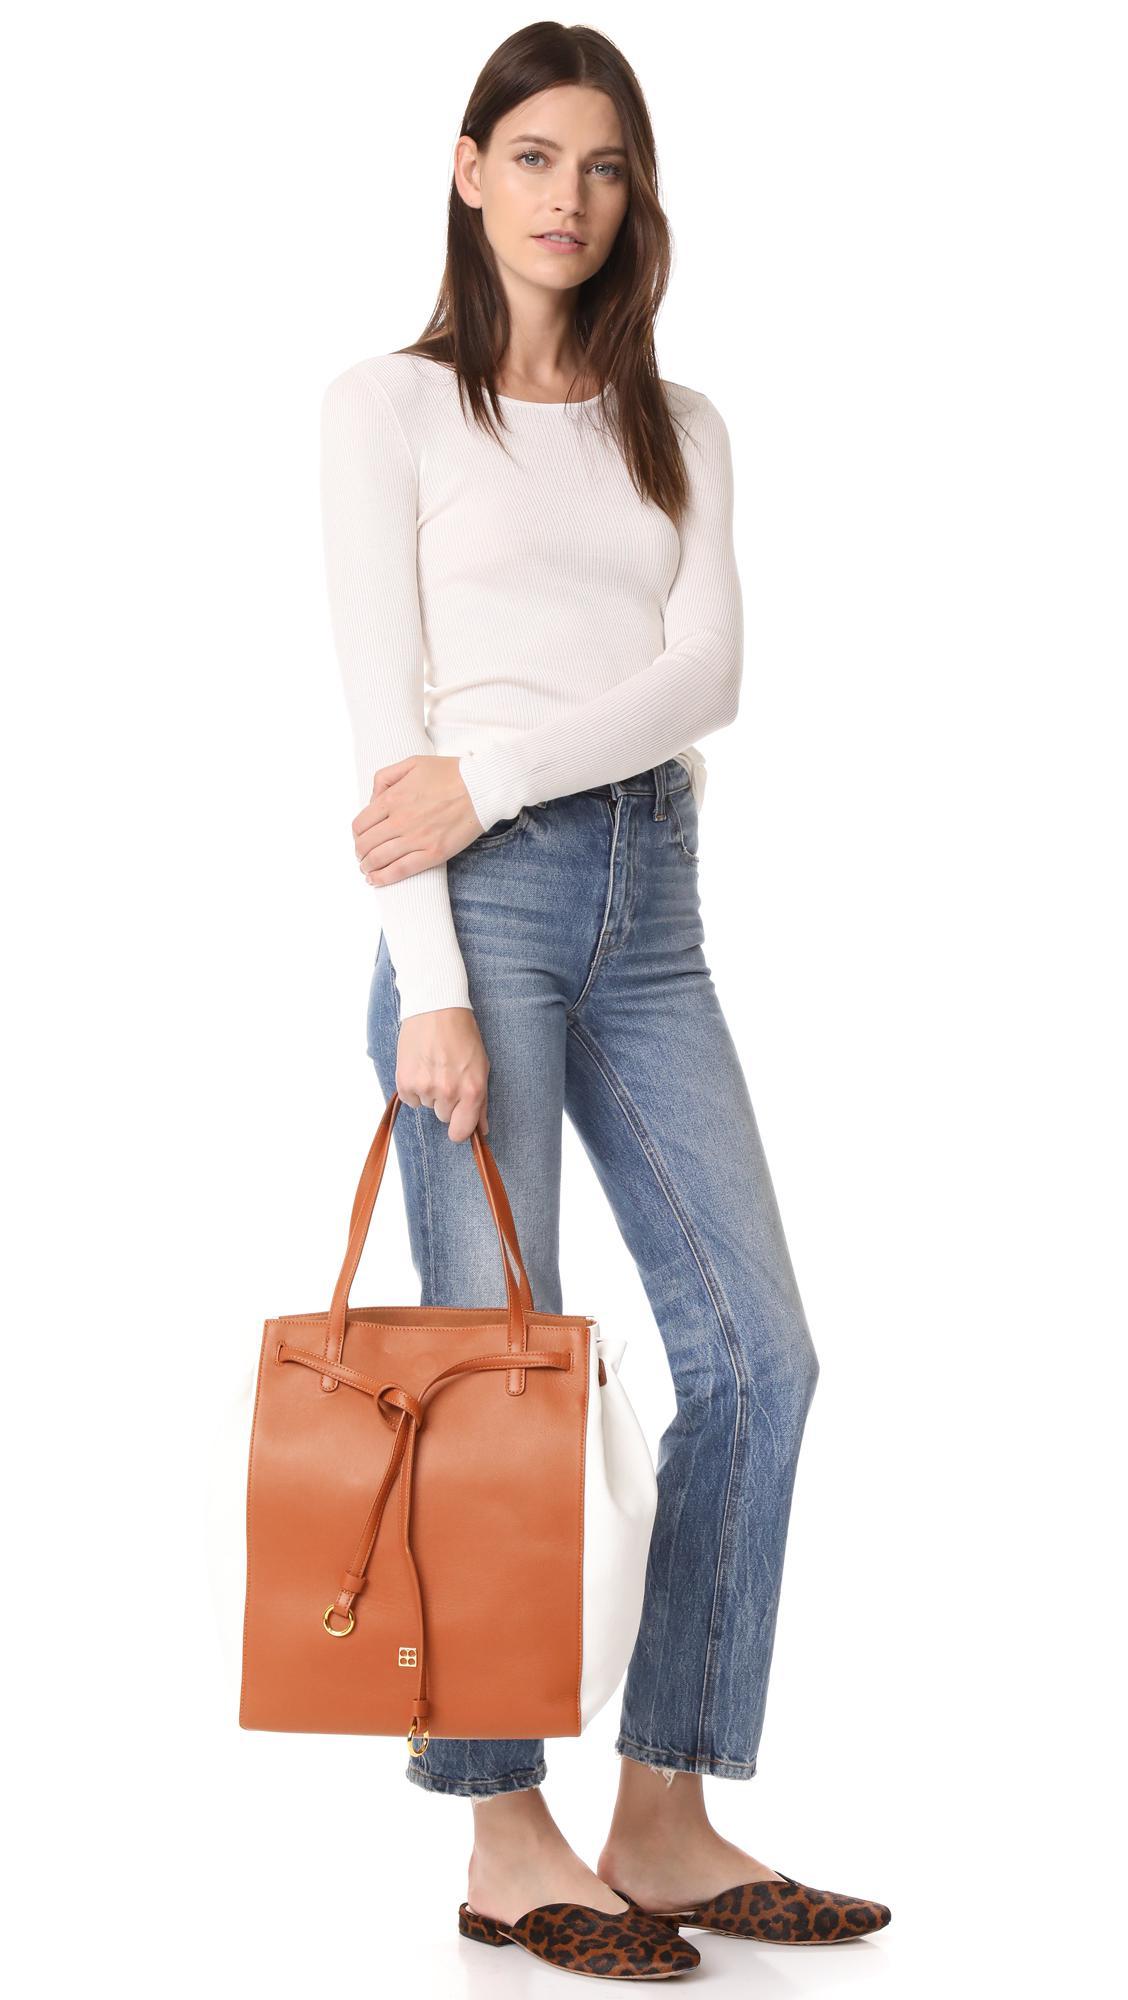 Parisa Wang Leather Addicted Tote in Brown